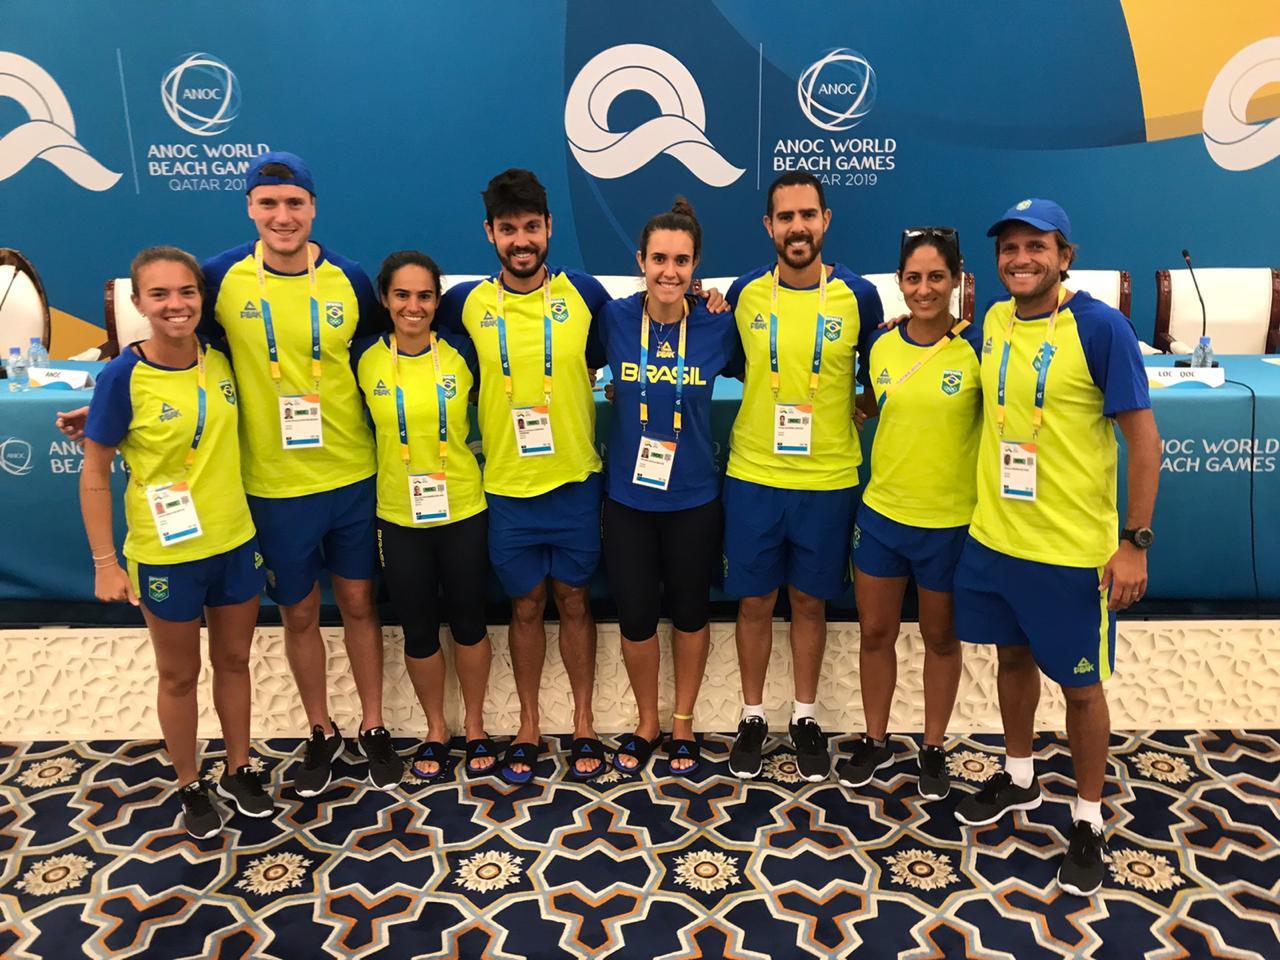 Beach Tennis do Brasil participa dos Jogos Mundiais de Praia